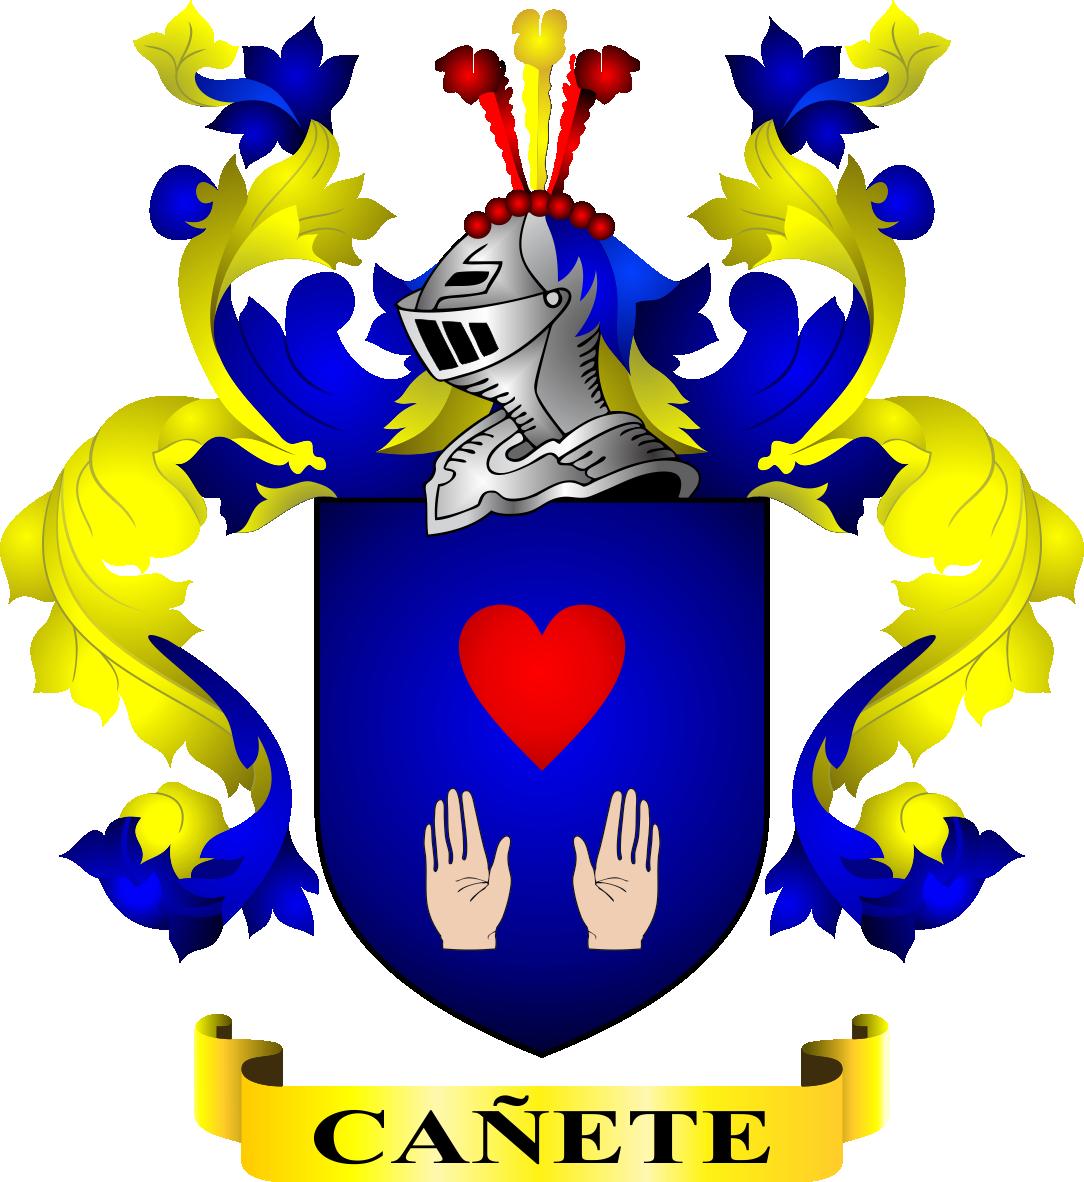 Archivo:Escudo de San vicente.png - Wikipedia, la enciclopedia libre